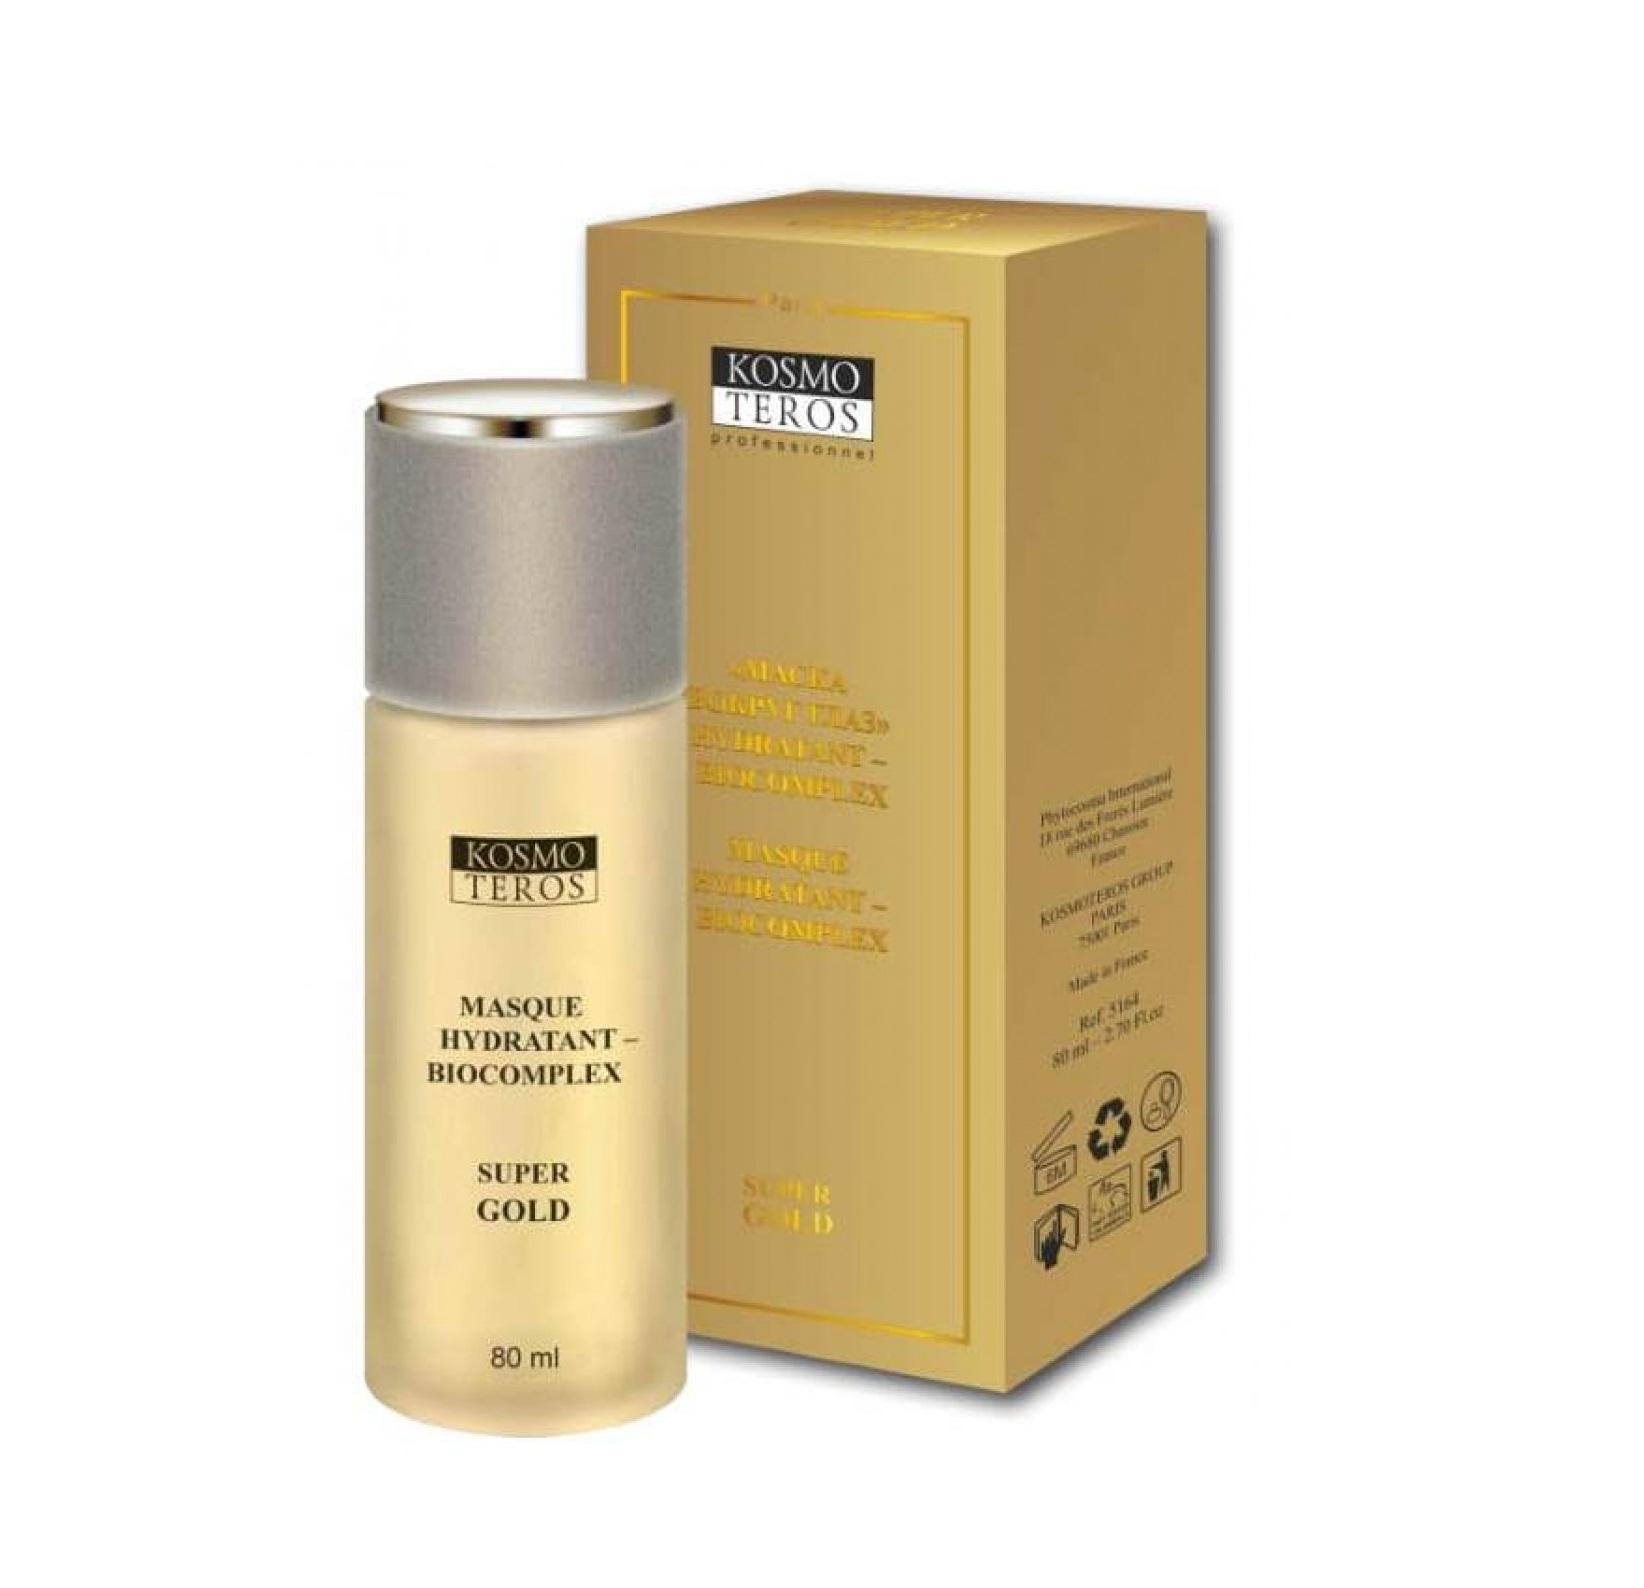 KOSMOTEROS PROFESSIONNEL Маска вокруг глаз / Hydratant-Biocomplexe Super Gold 80 мл.